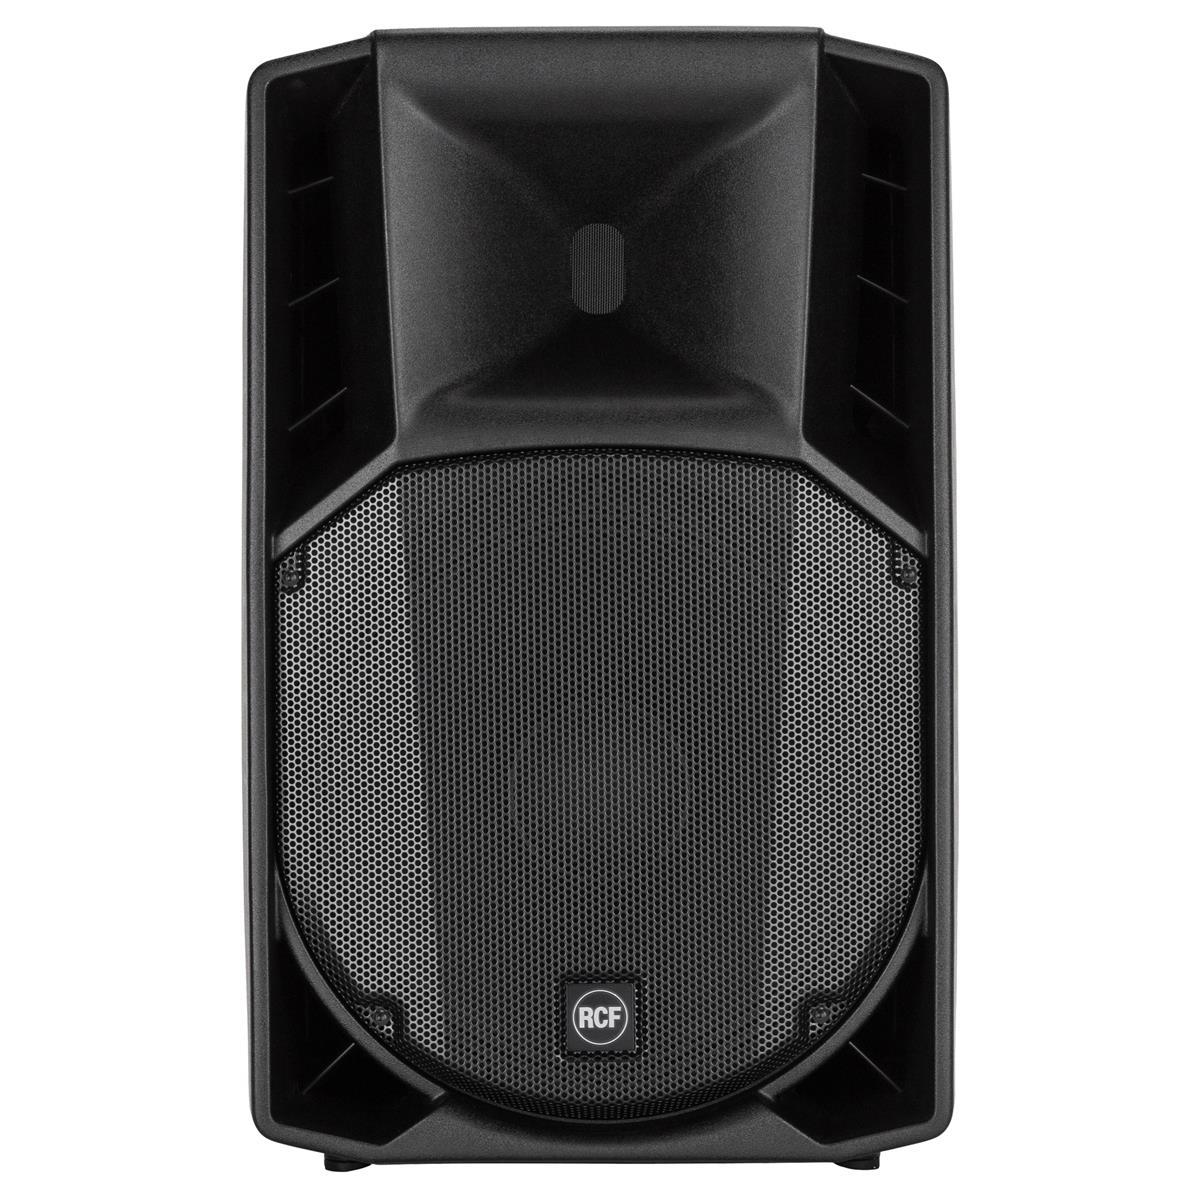 RCF Digital active speaker system 15in + 1in, 700Wrms, 1400W